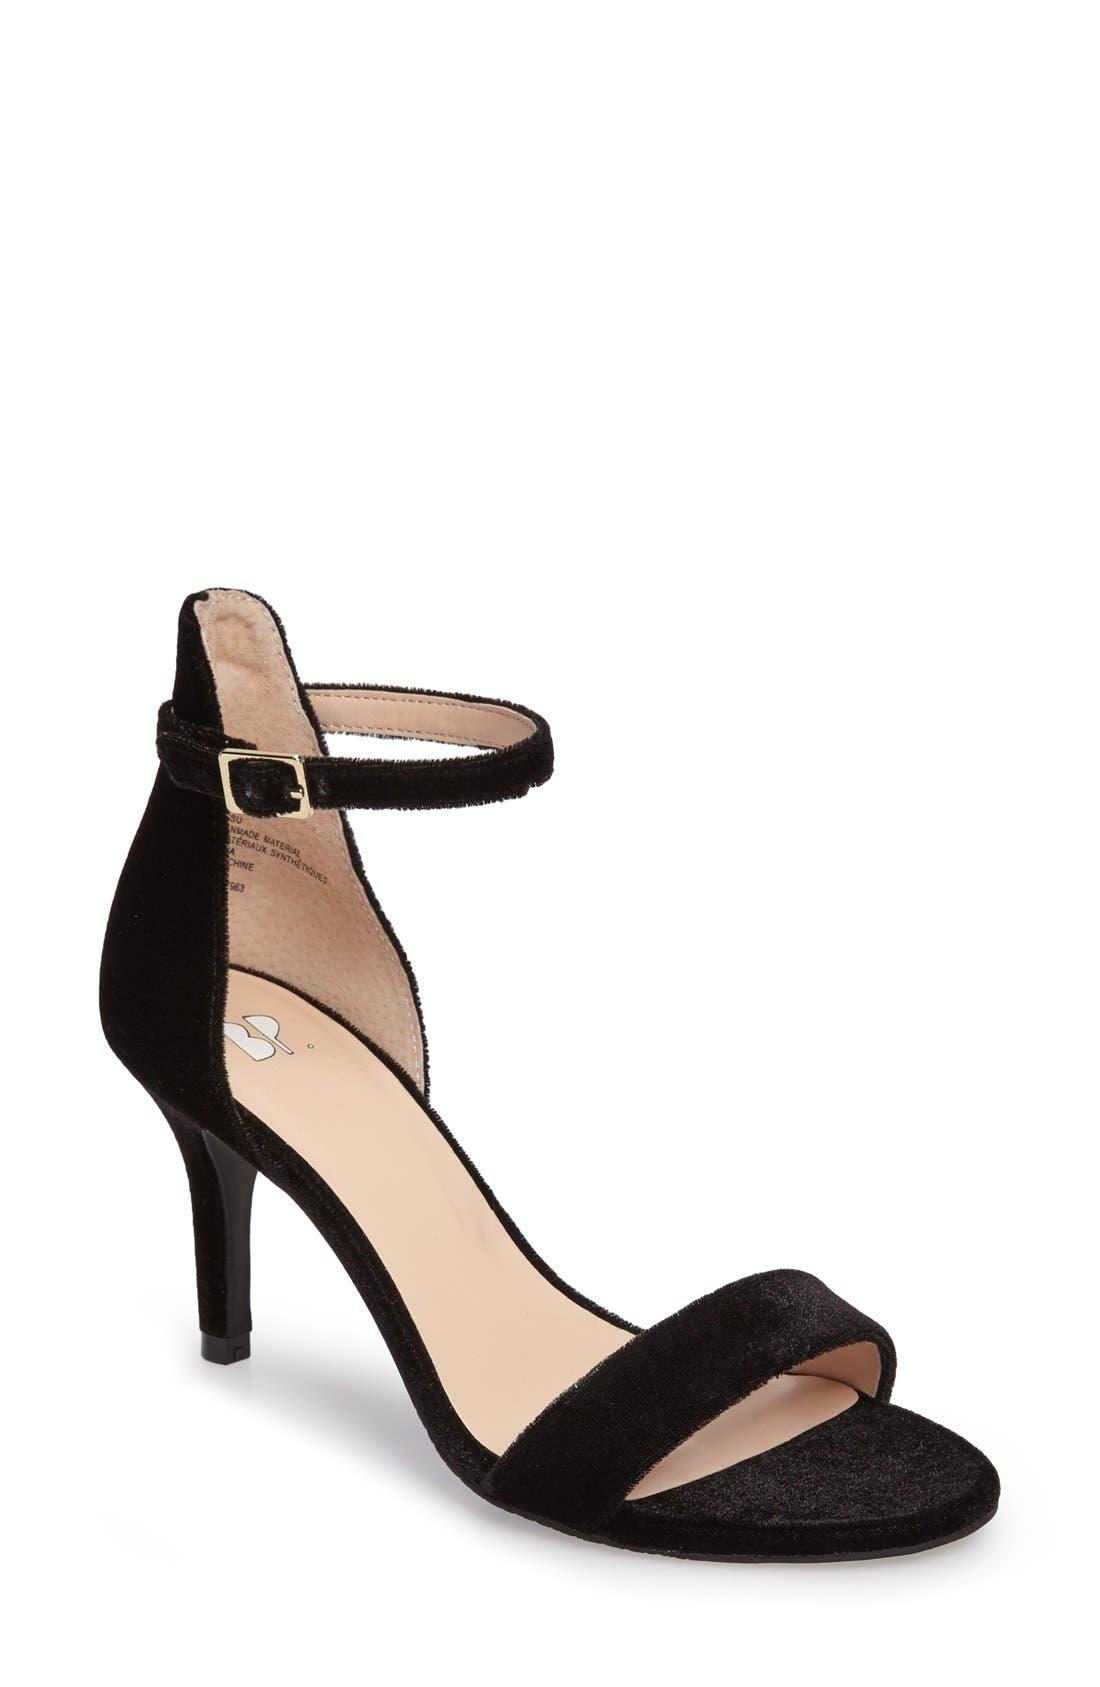 Alternate Image 1 Selected - BP. 'Luminate' Open Toe Dress Sandal (Women)